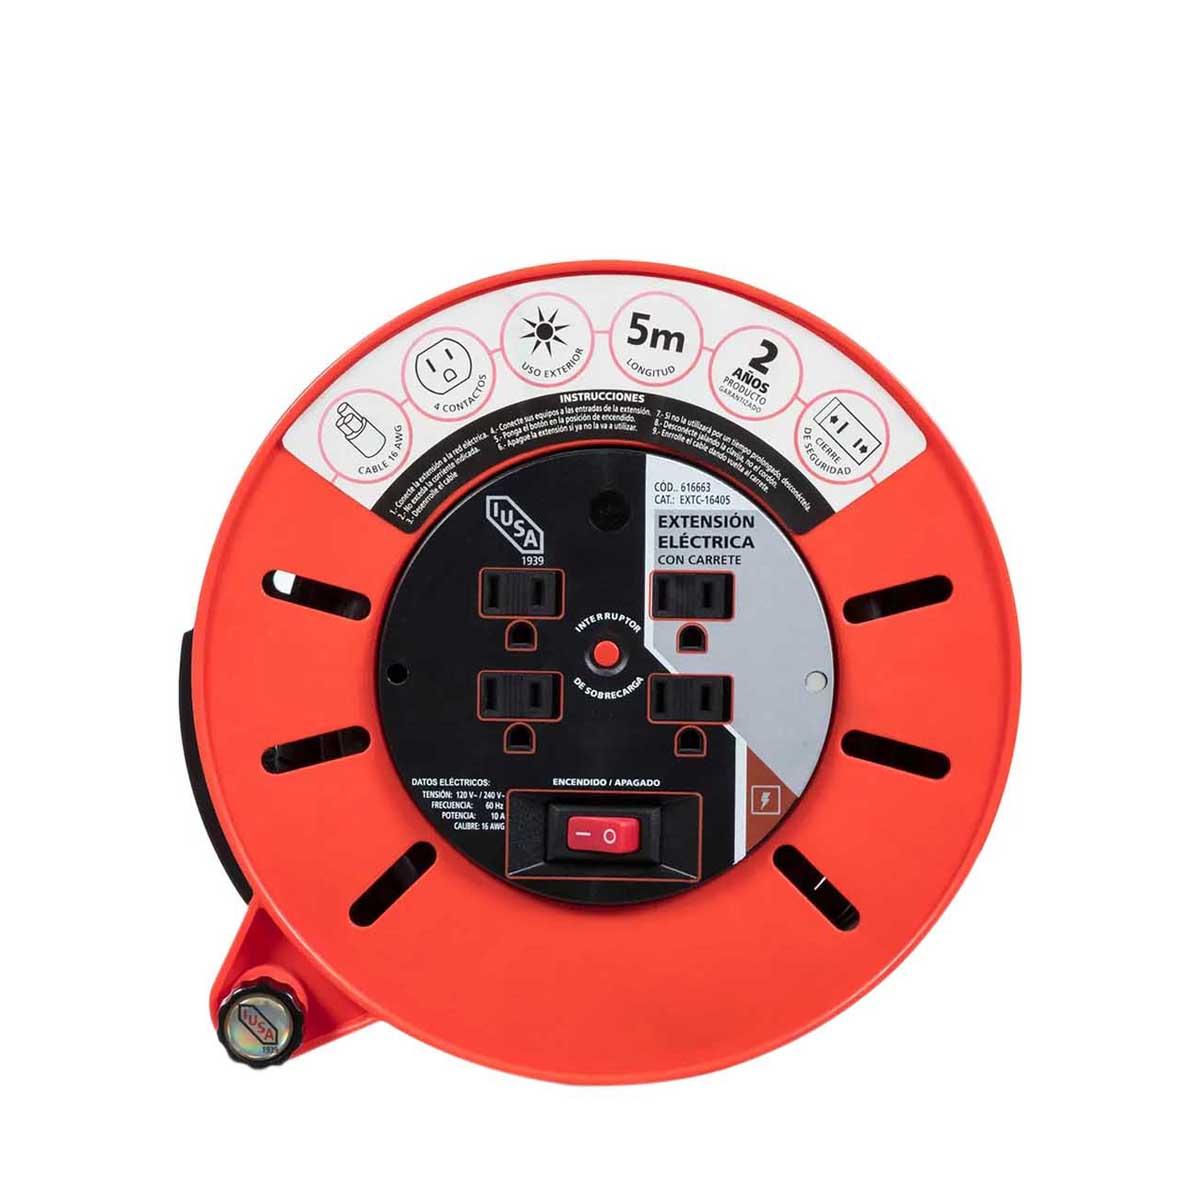 Extension Electrica 16 Awg Con Carrete 5 M 4 Entradas Iusa